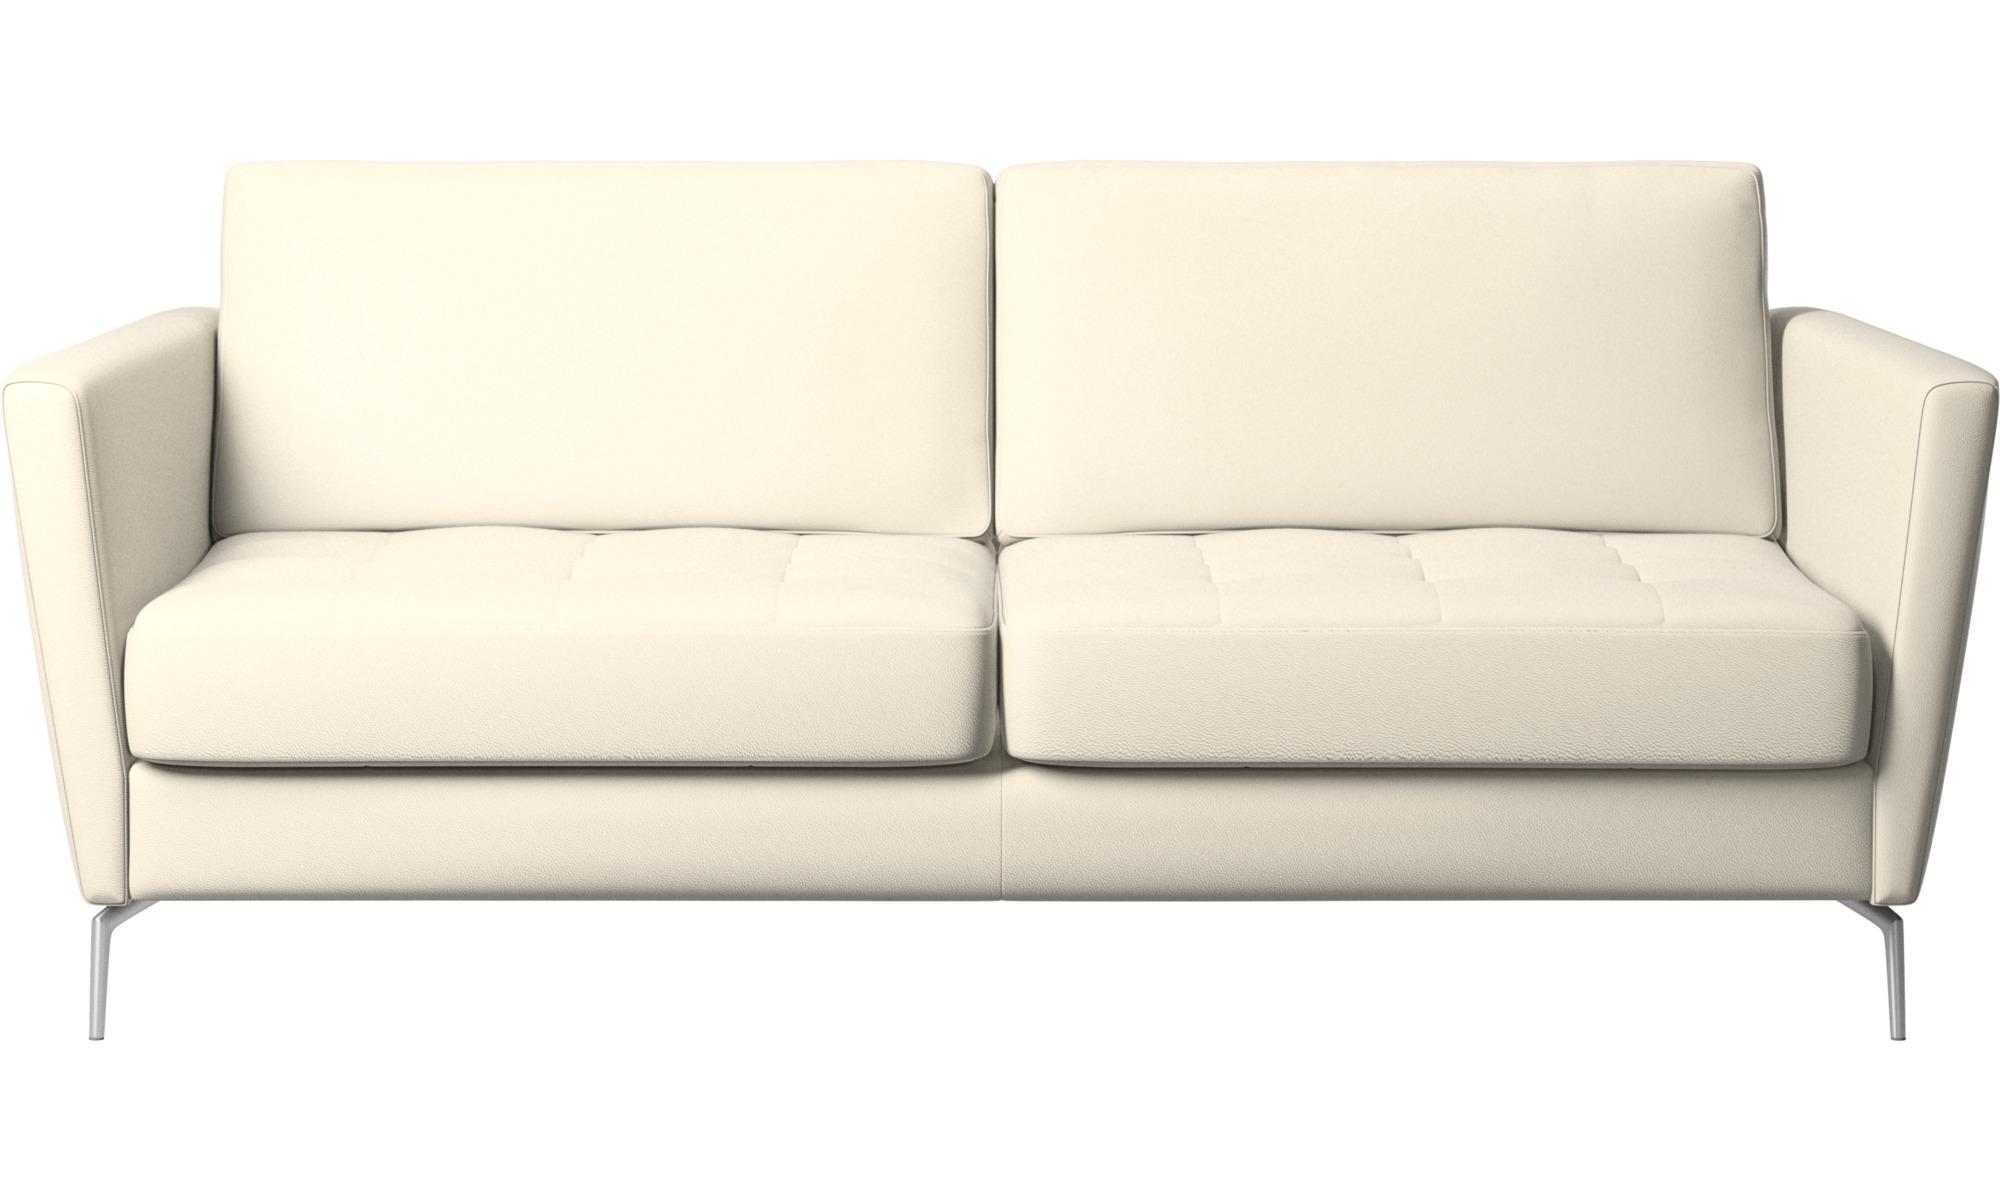 Sofa beds - Osaka sofa bed, tufted seat - White - Leather